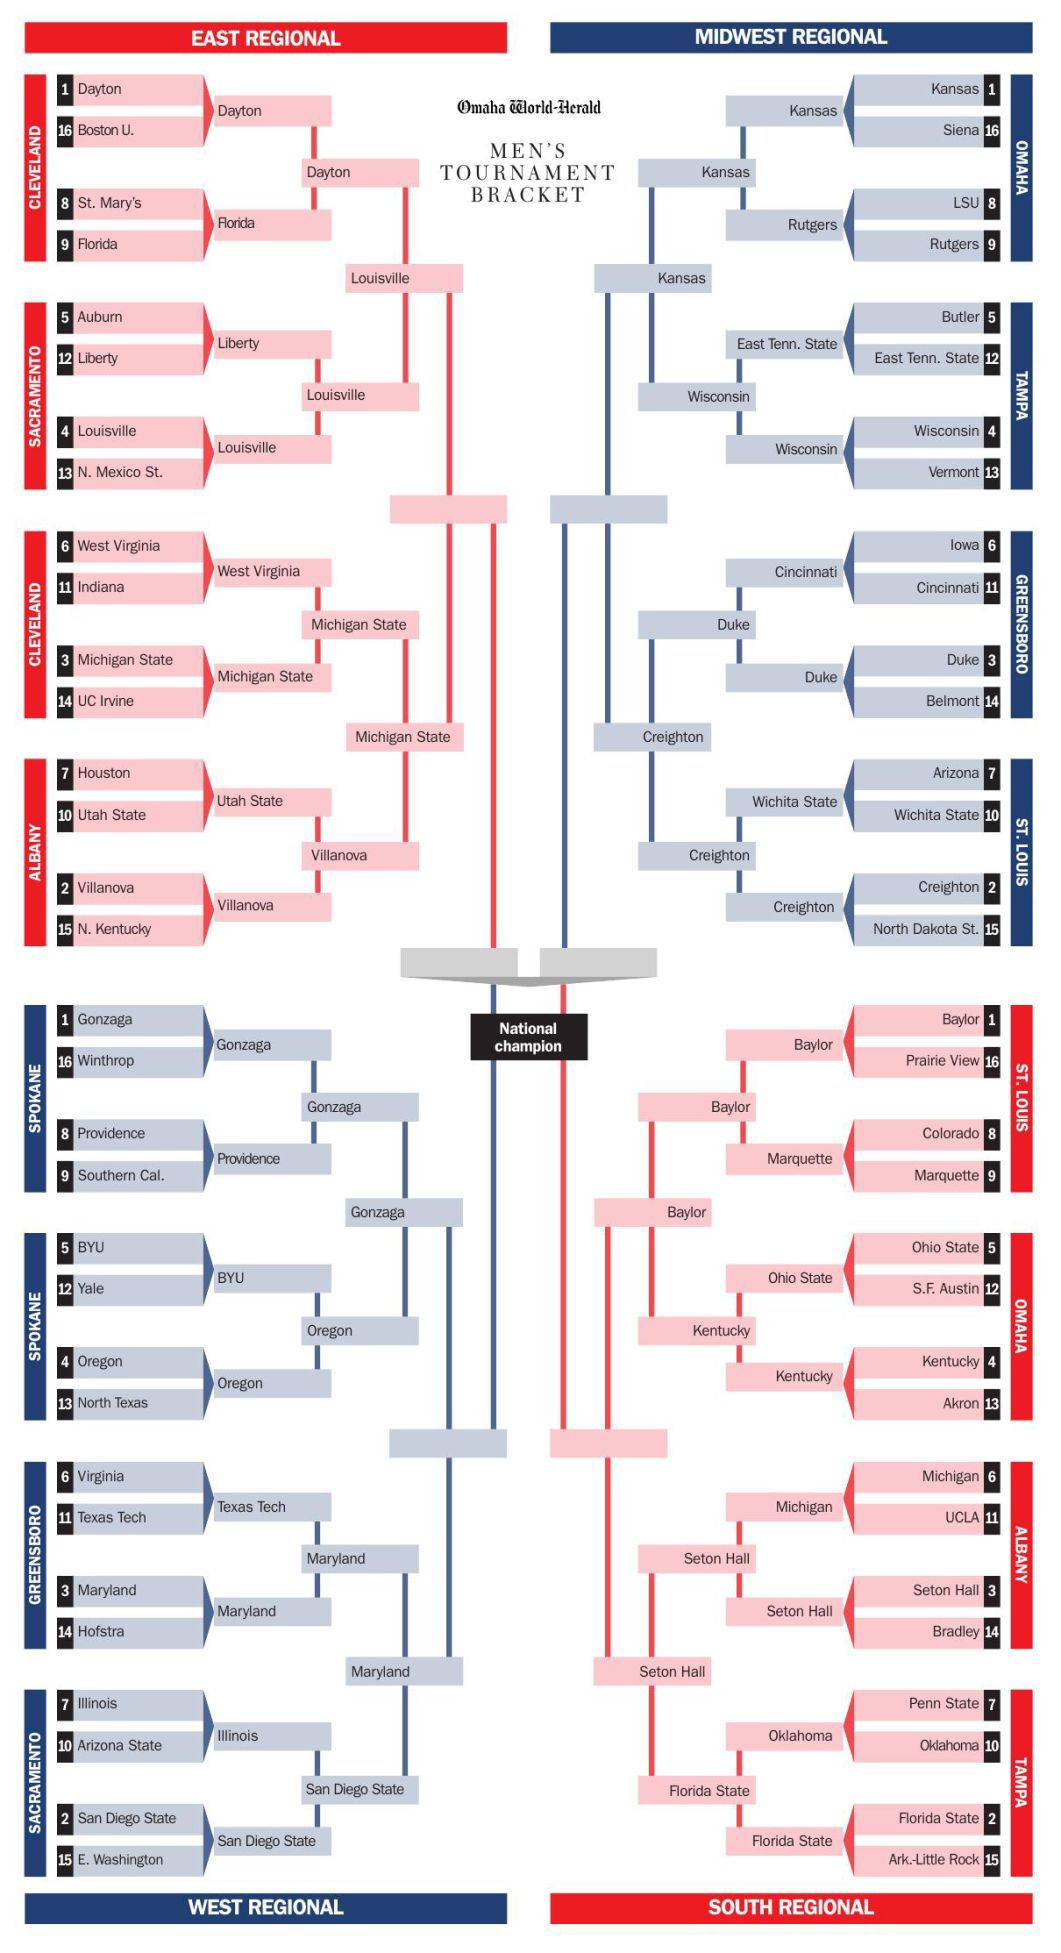 2020 World-Herald NCAA tournament